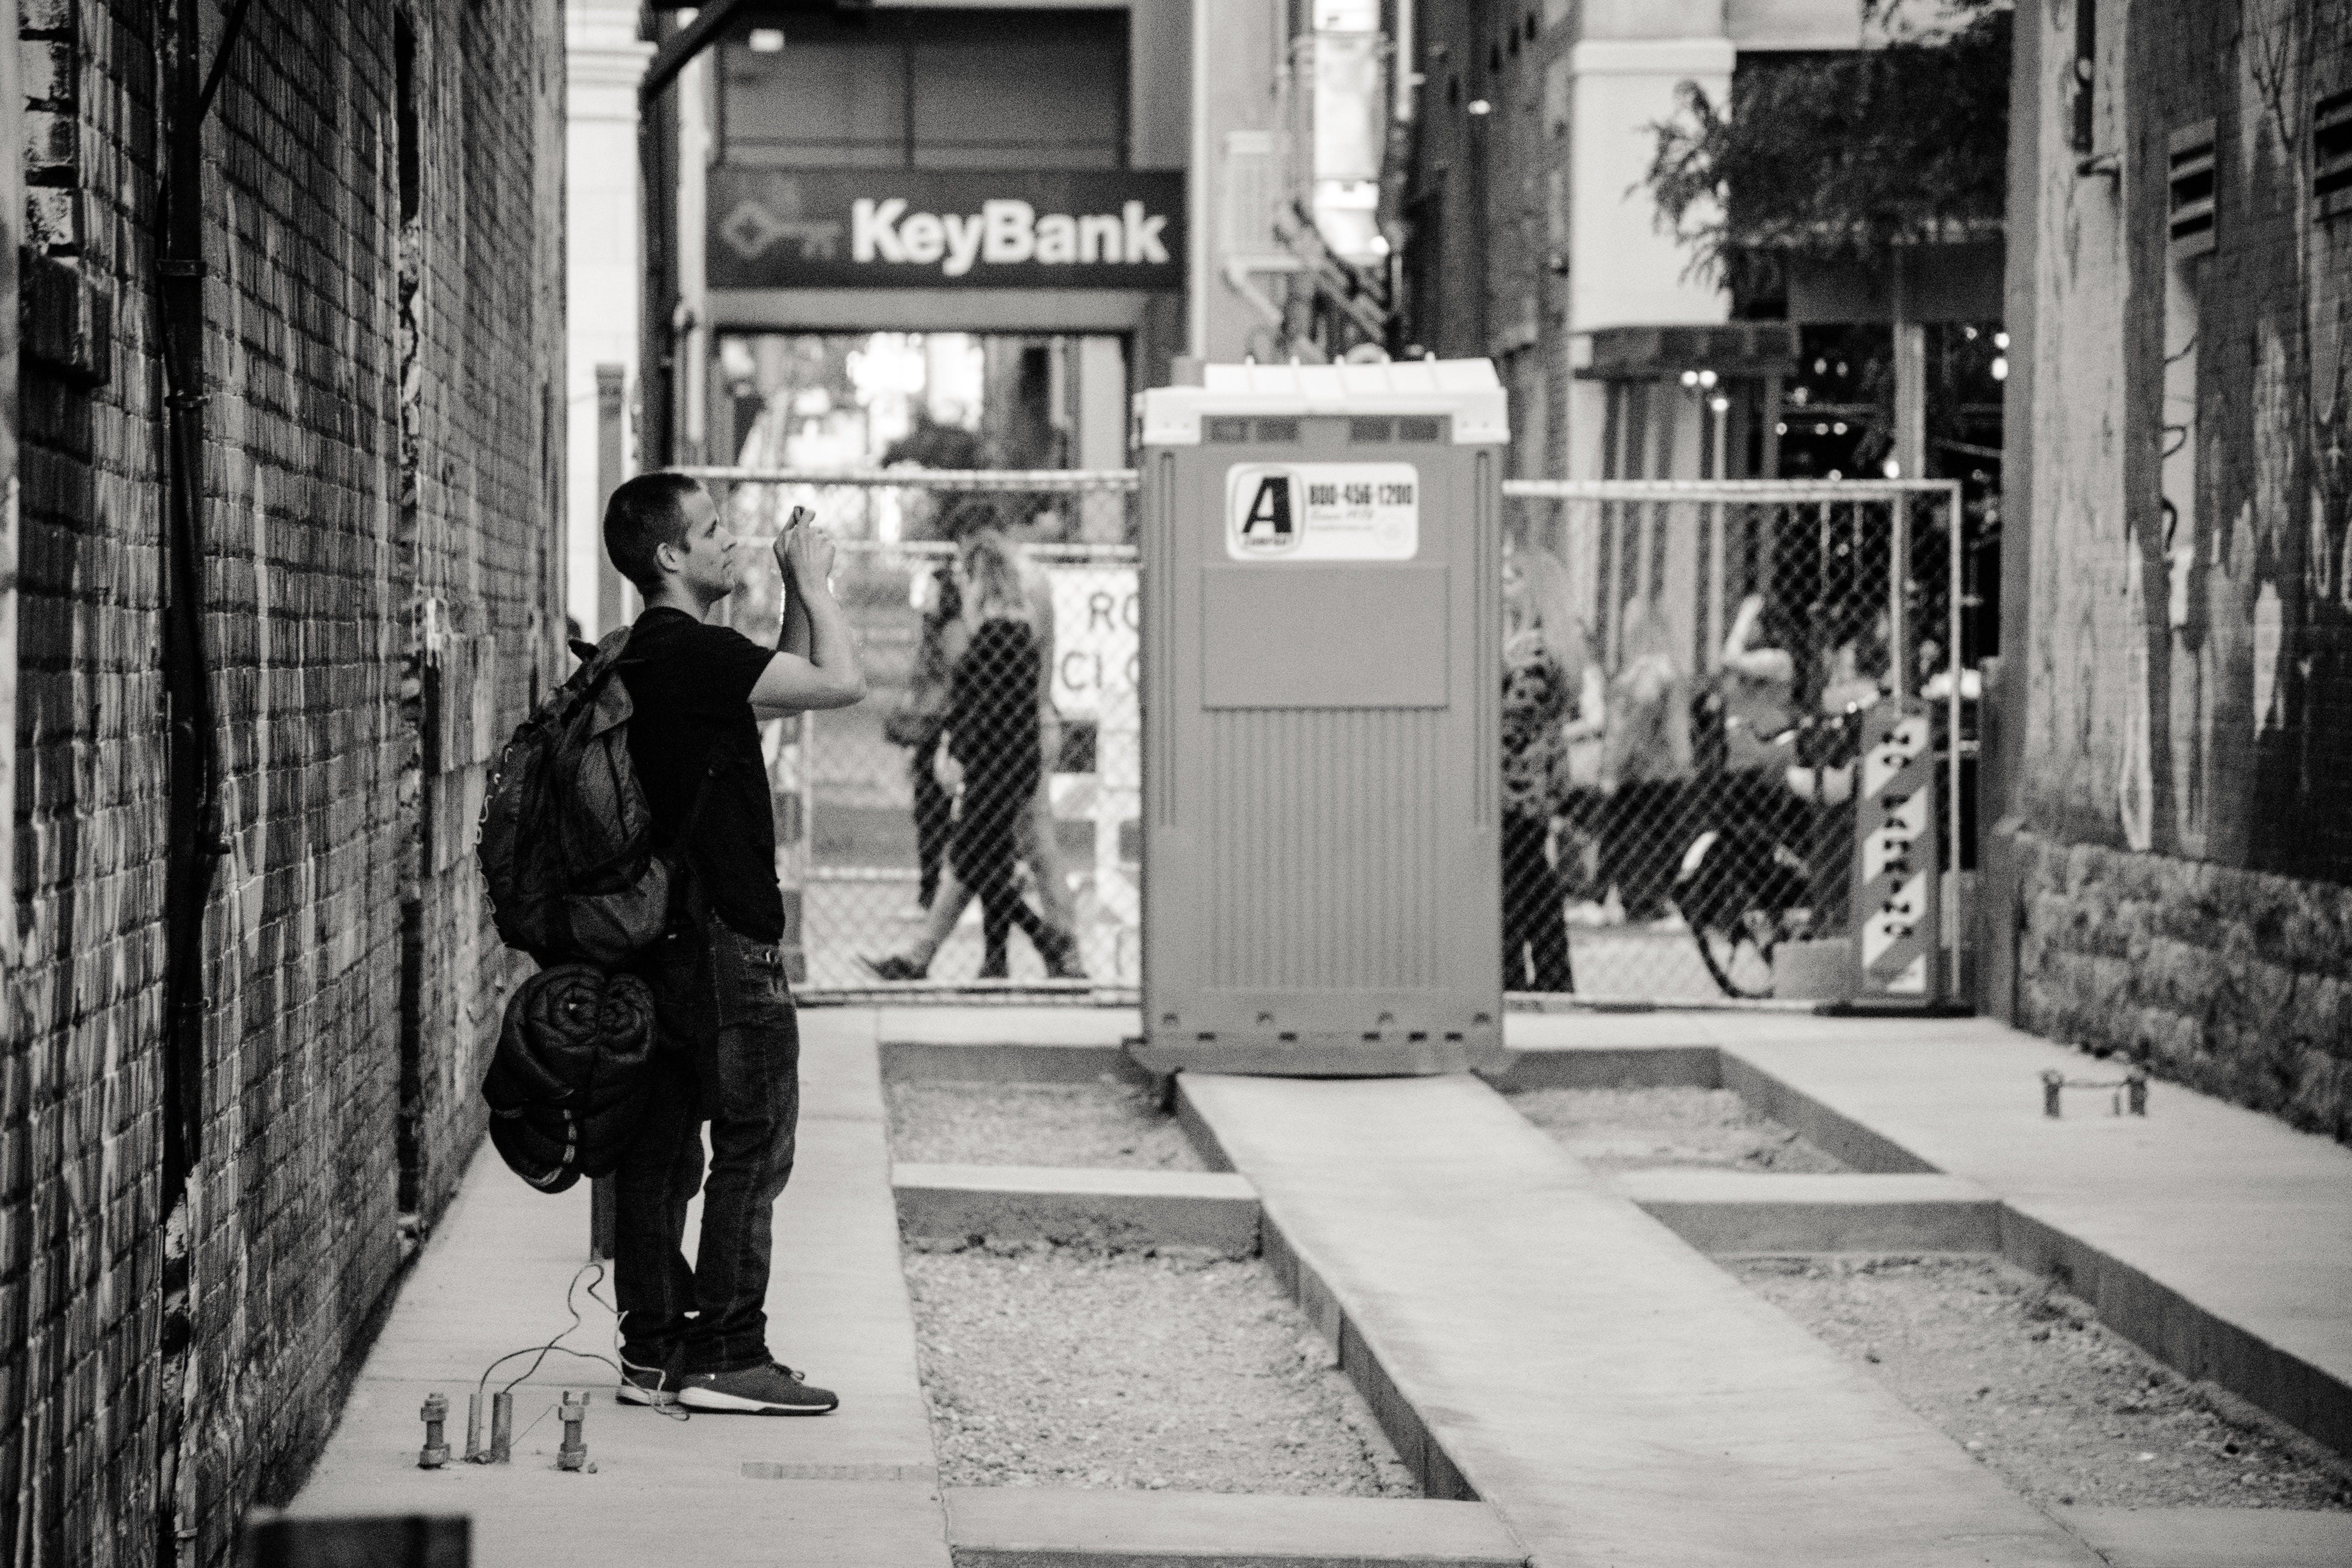 Man Standing Near Keybank Signage